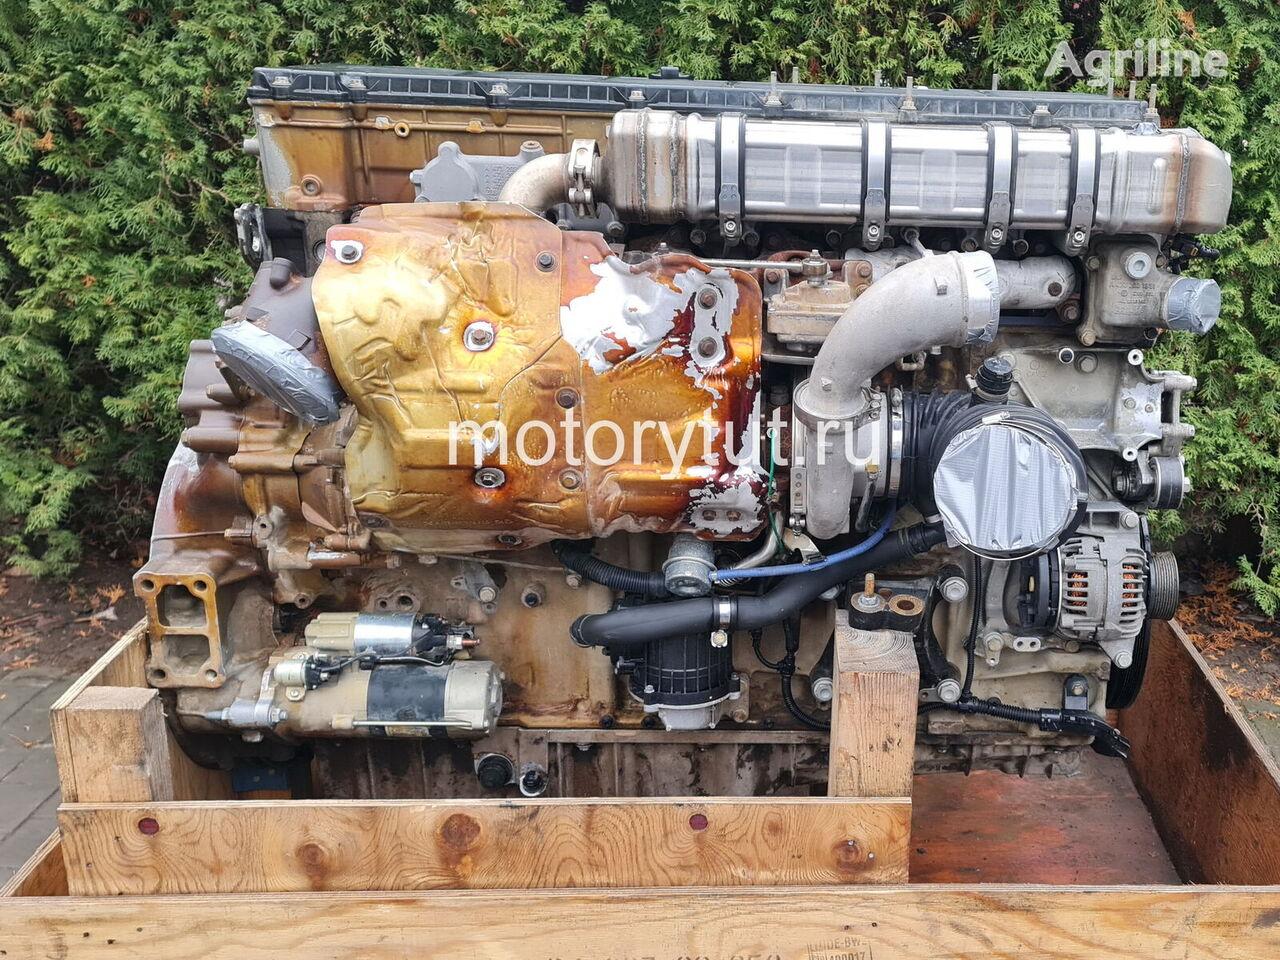 MERCEDES-BENZ OM 473 LA (473.905) engine for CLAAS grain harvester